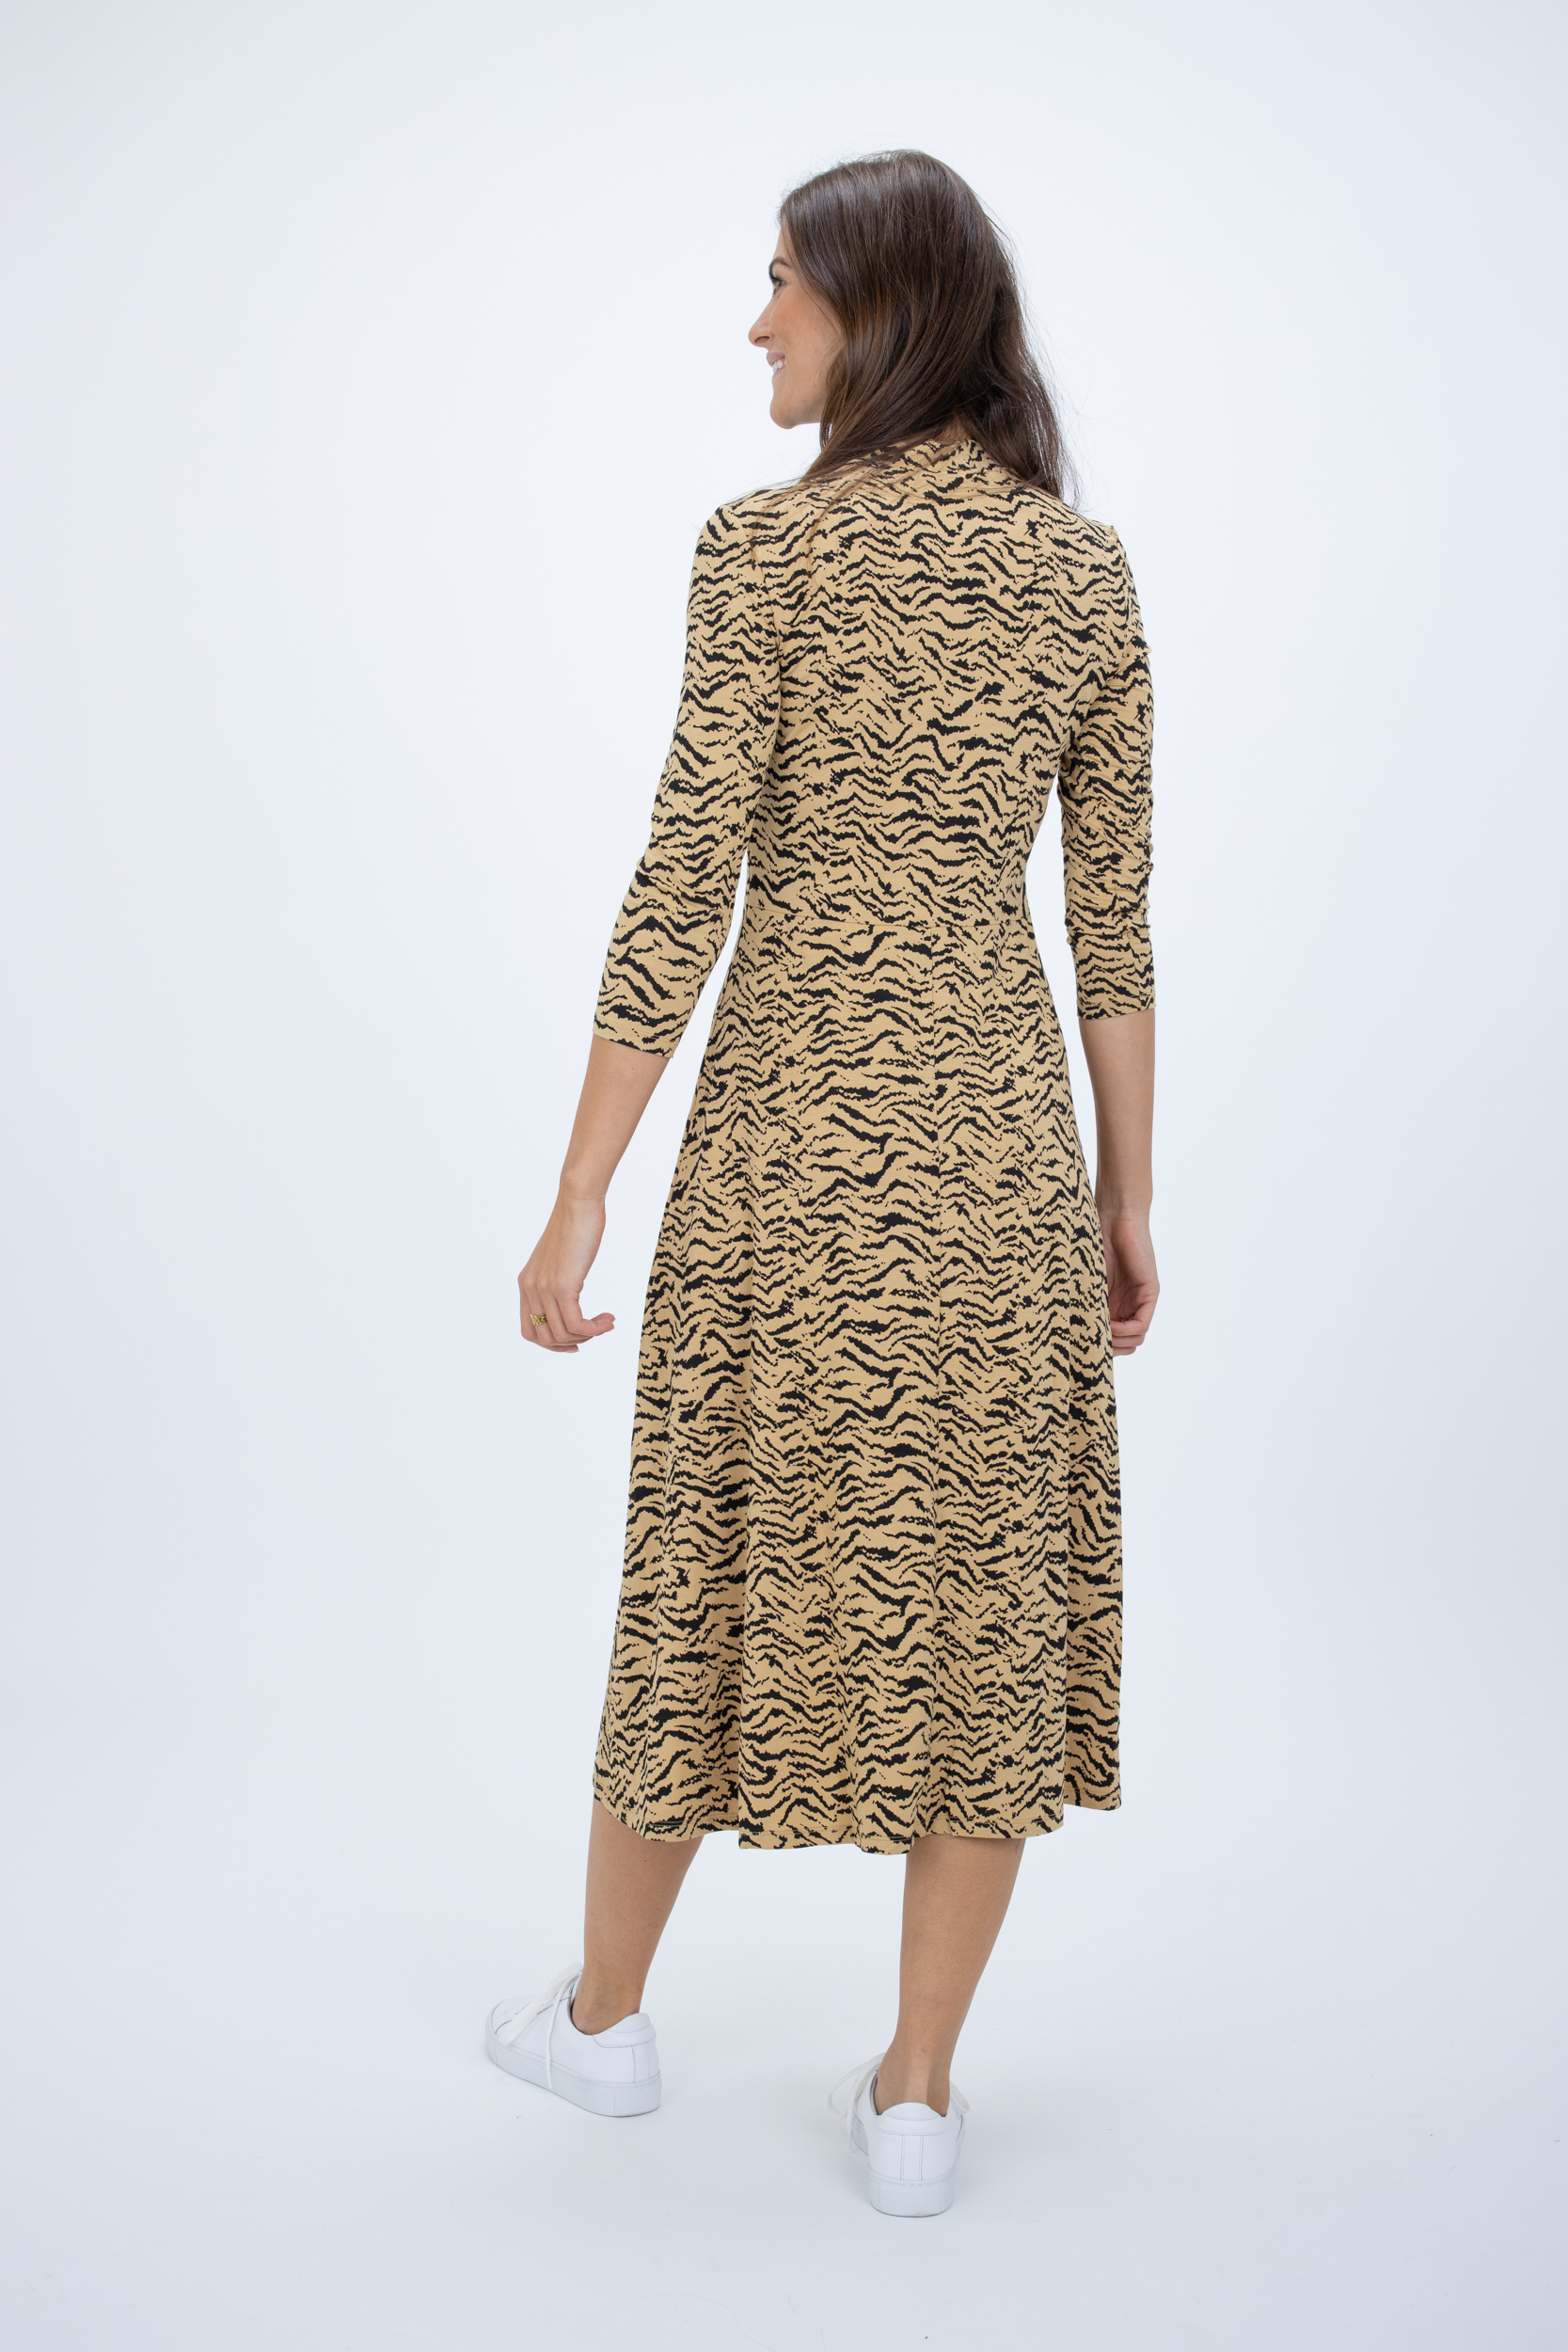 Kleid mit Essential Tiger-Print